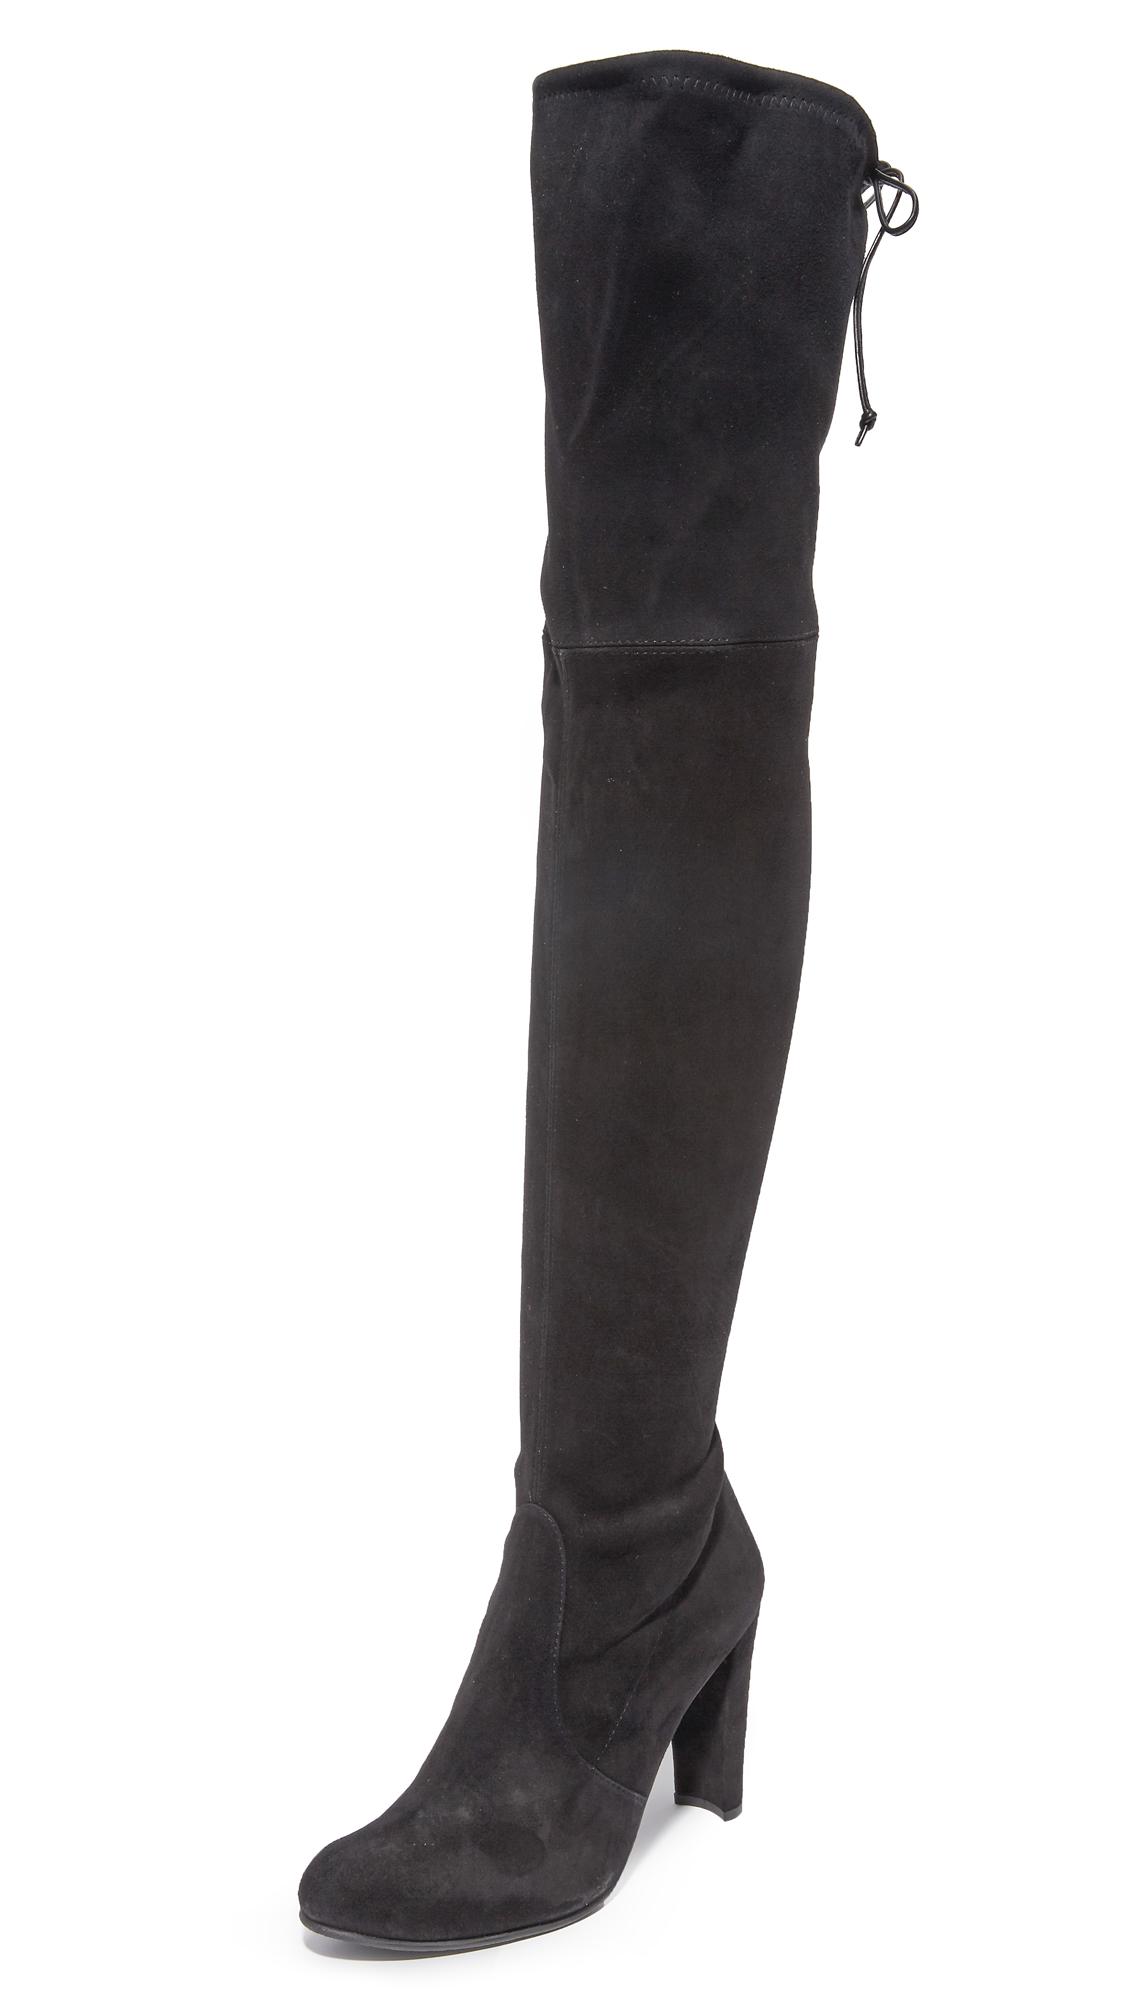 Stuart Weitzman Highland Over The Knee Boots - Black